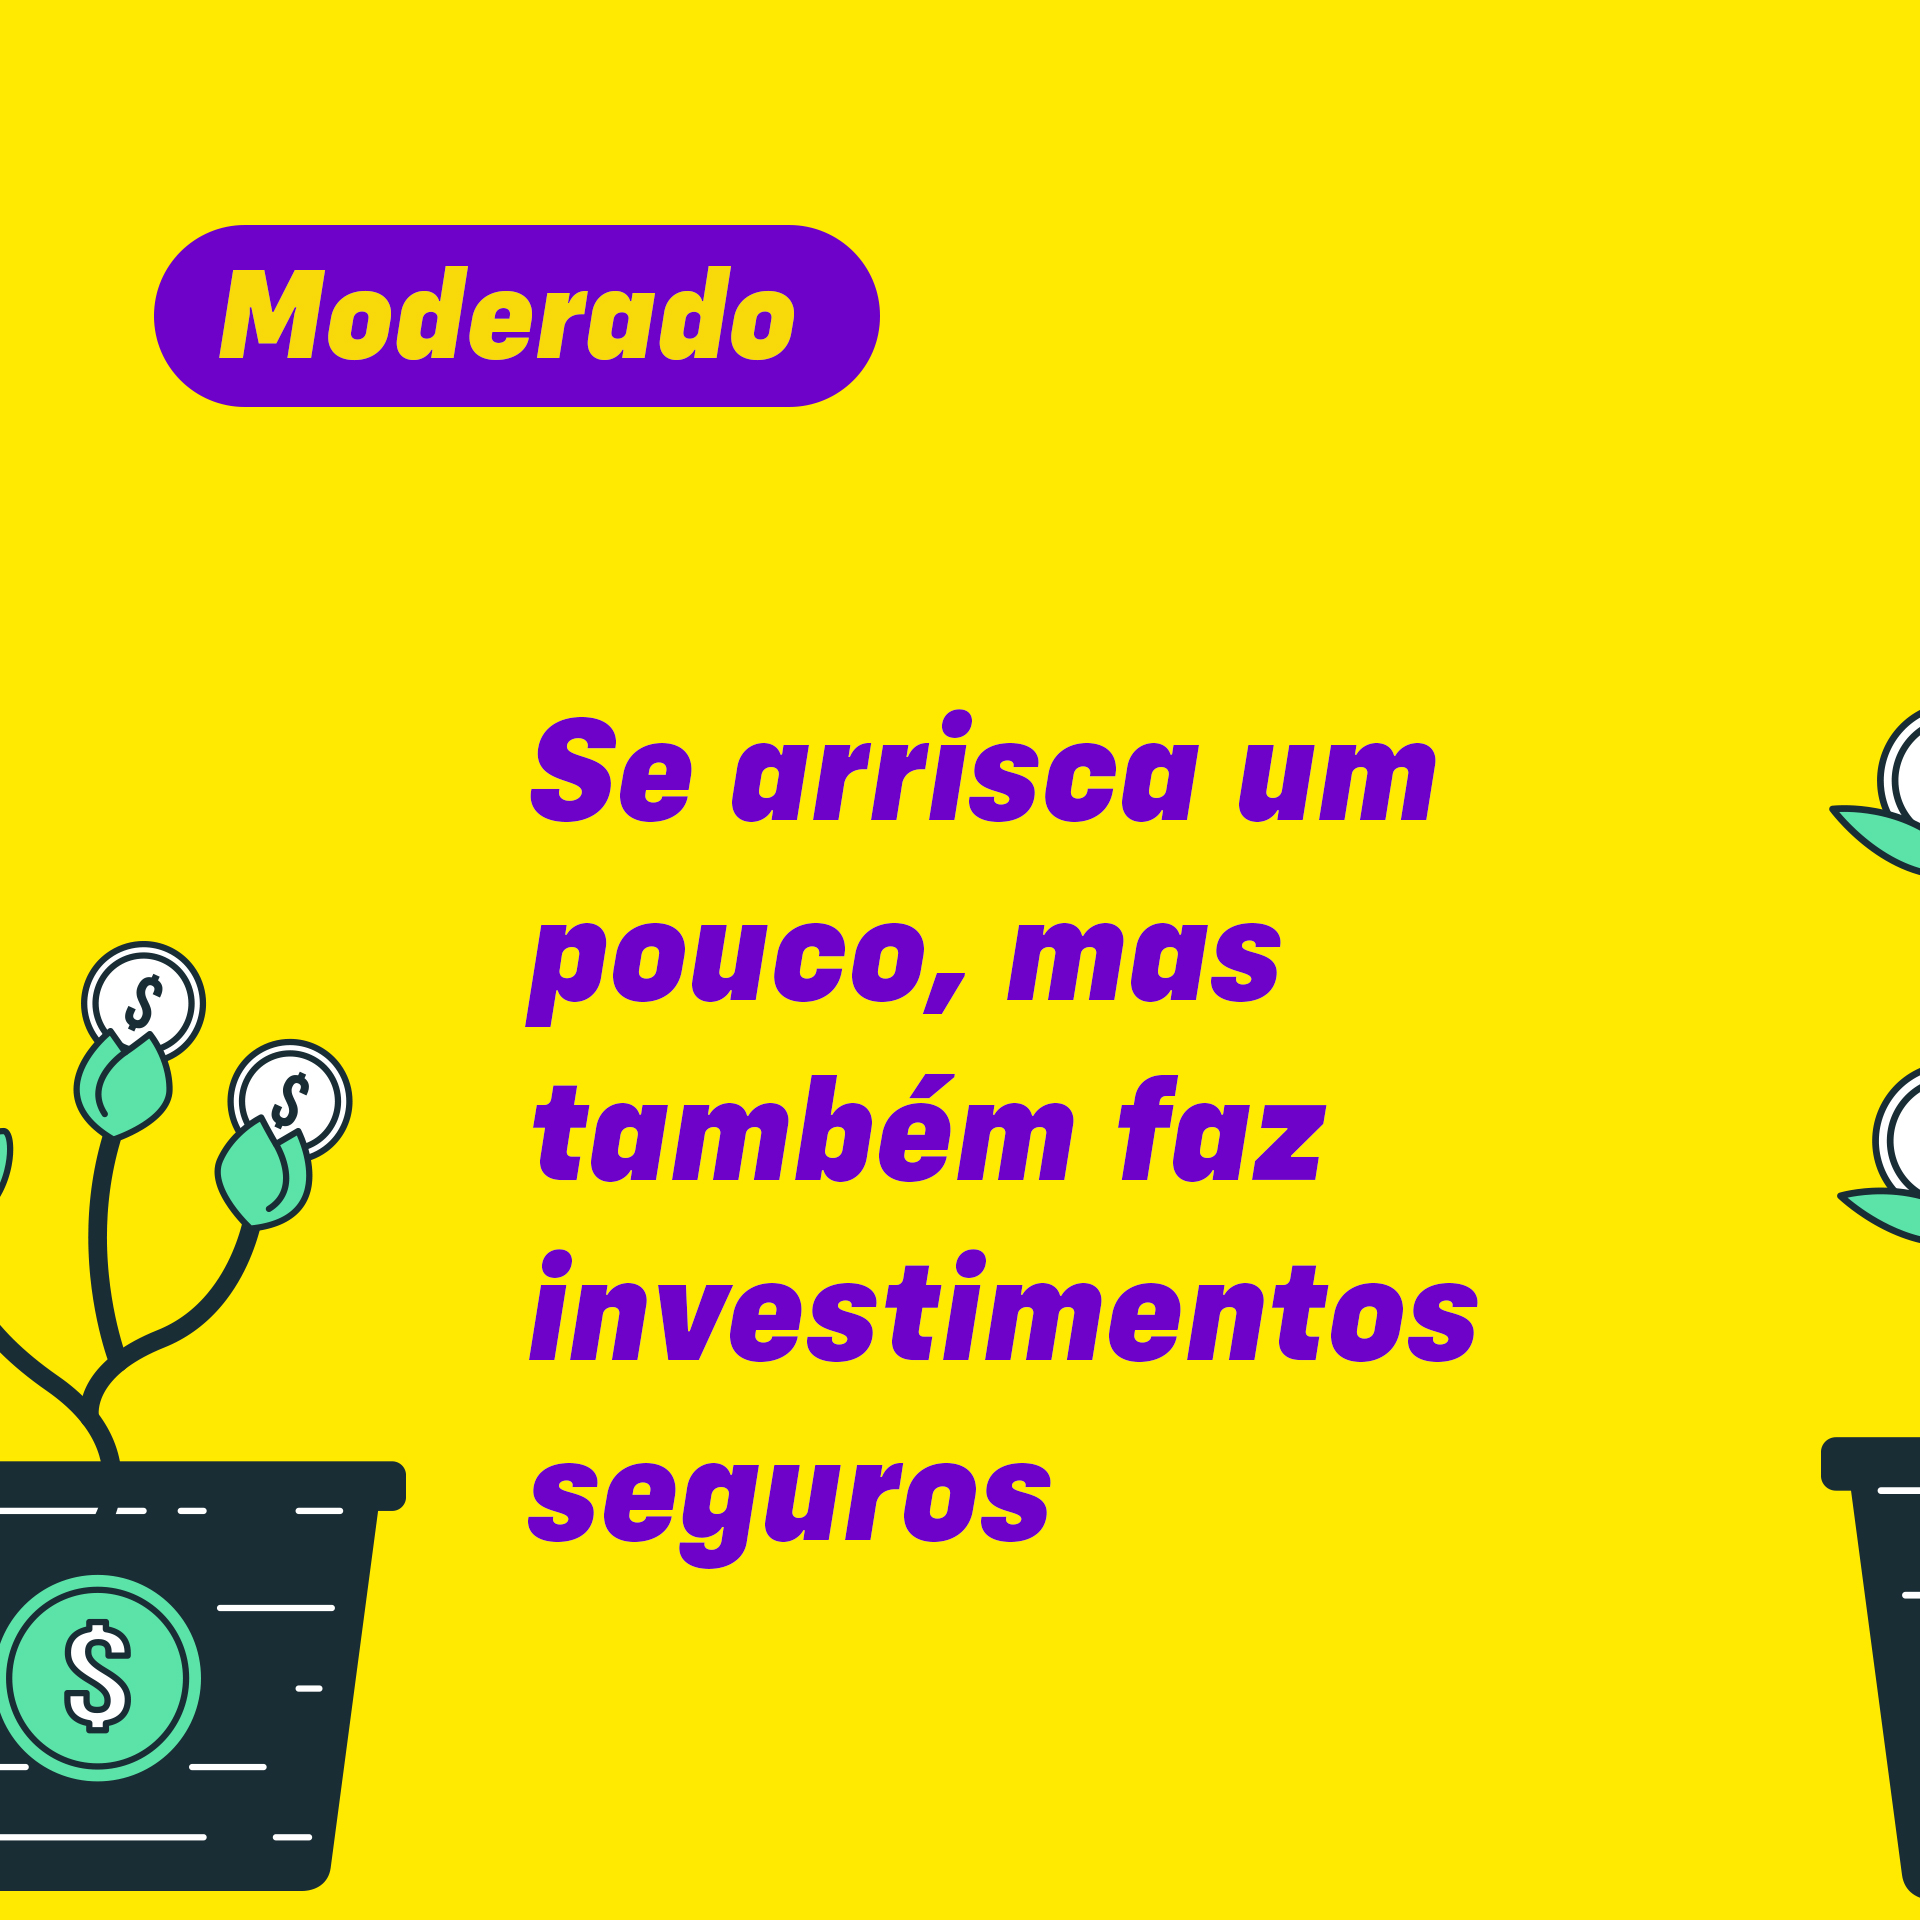 Perfil de investidor 3